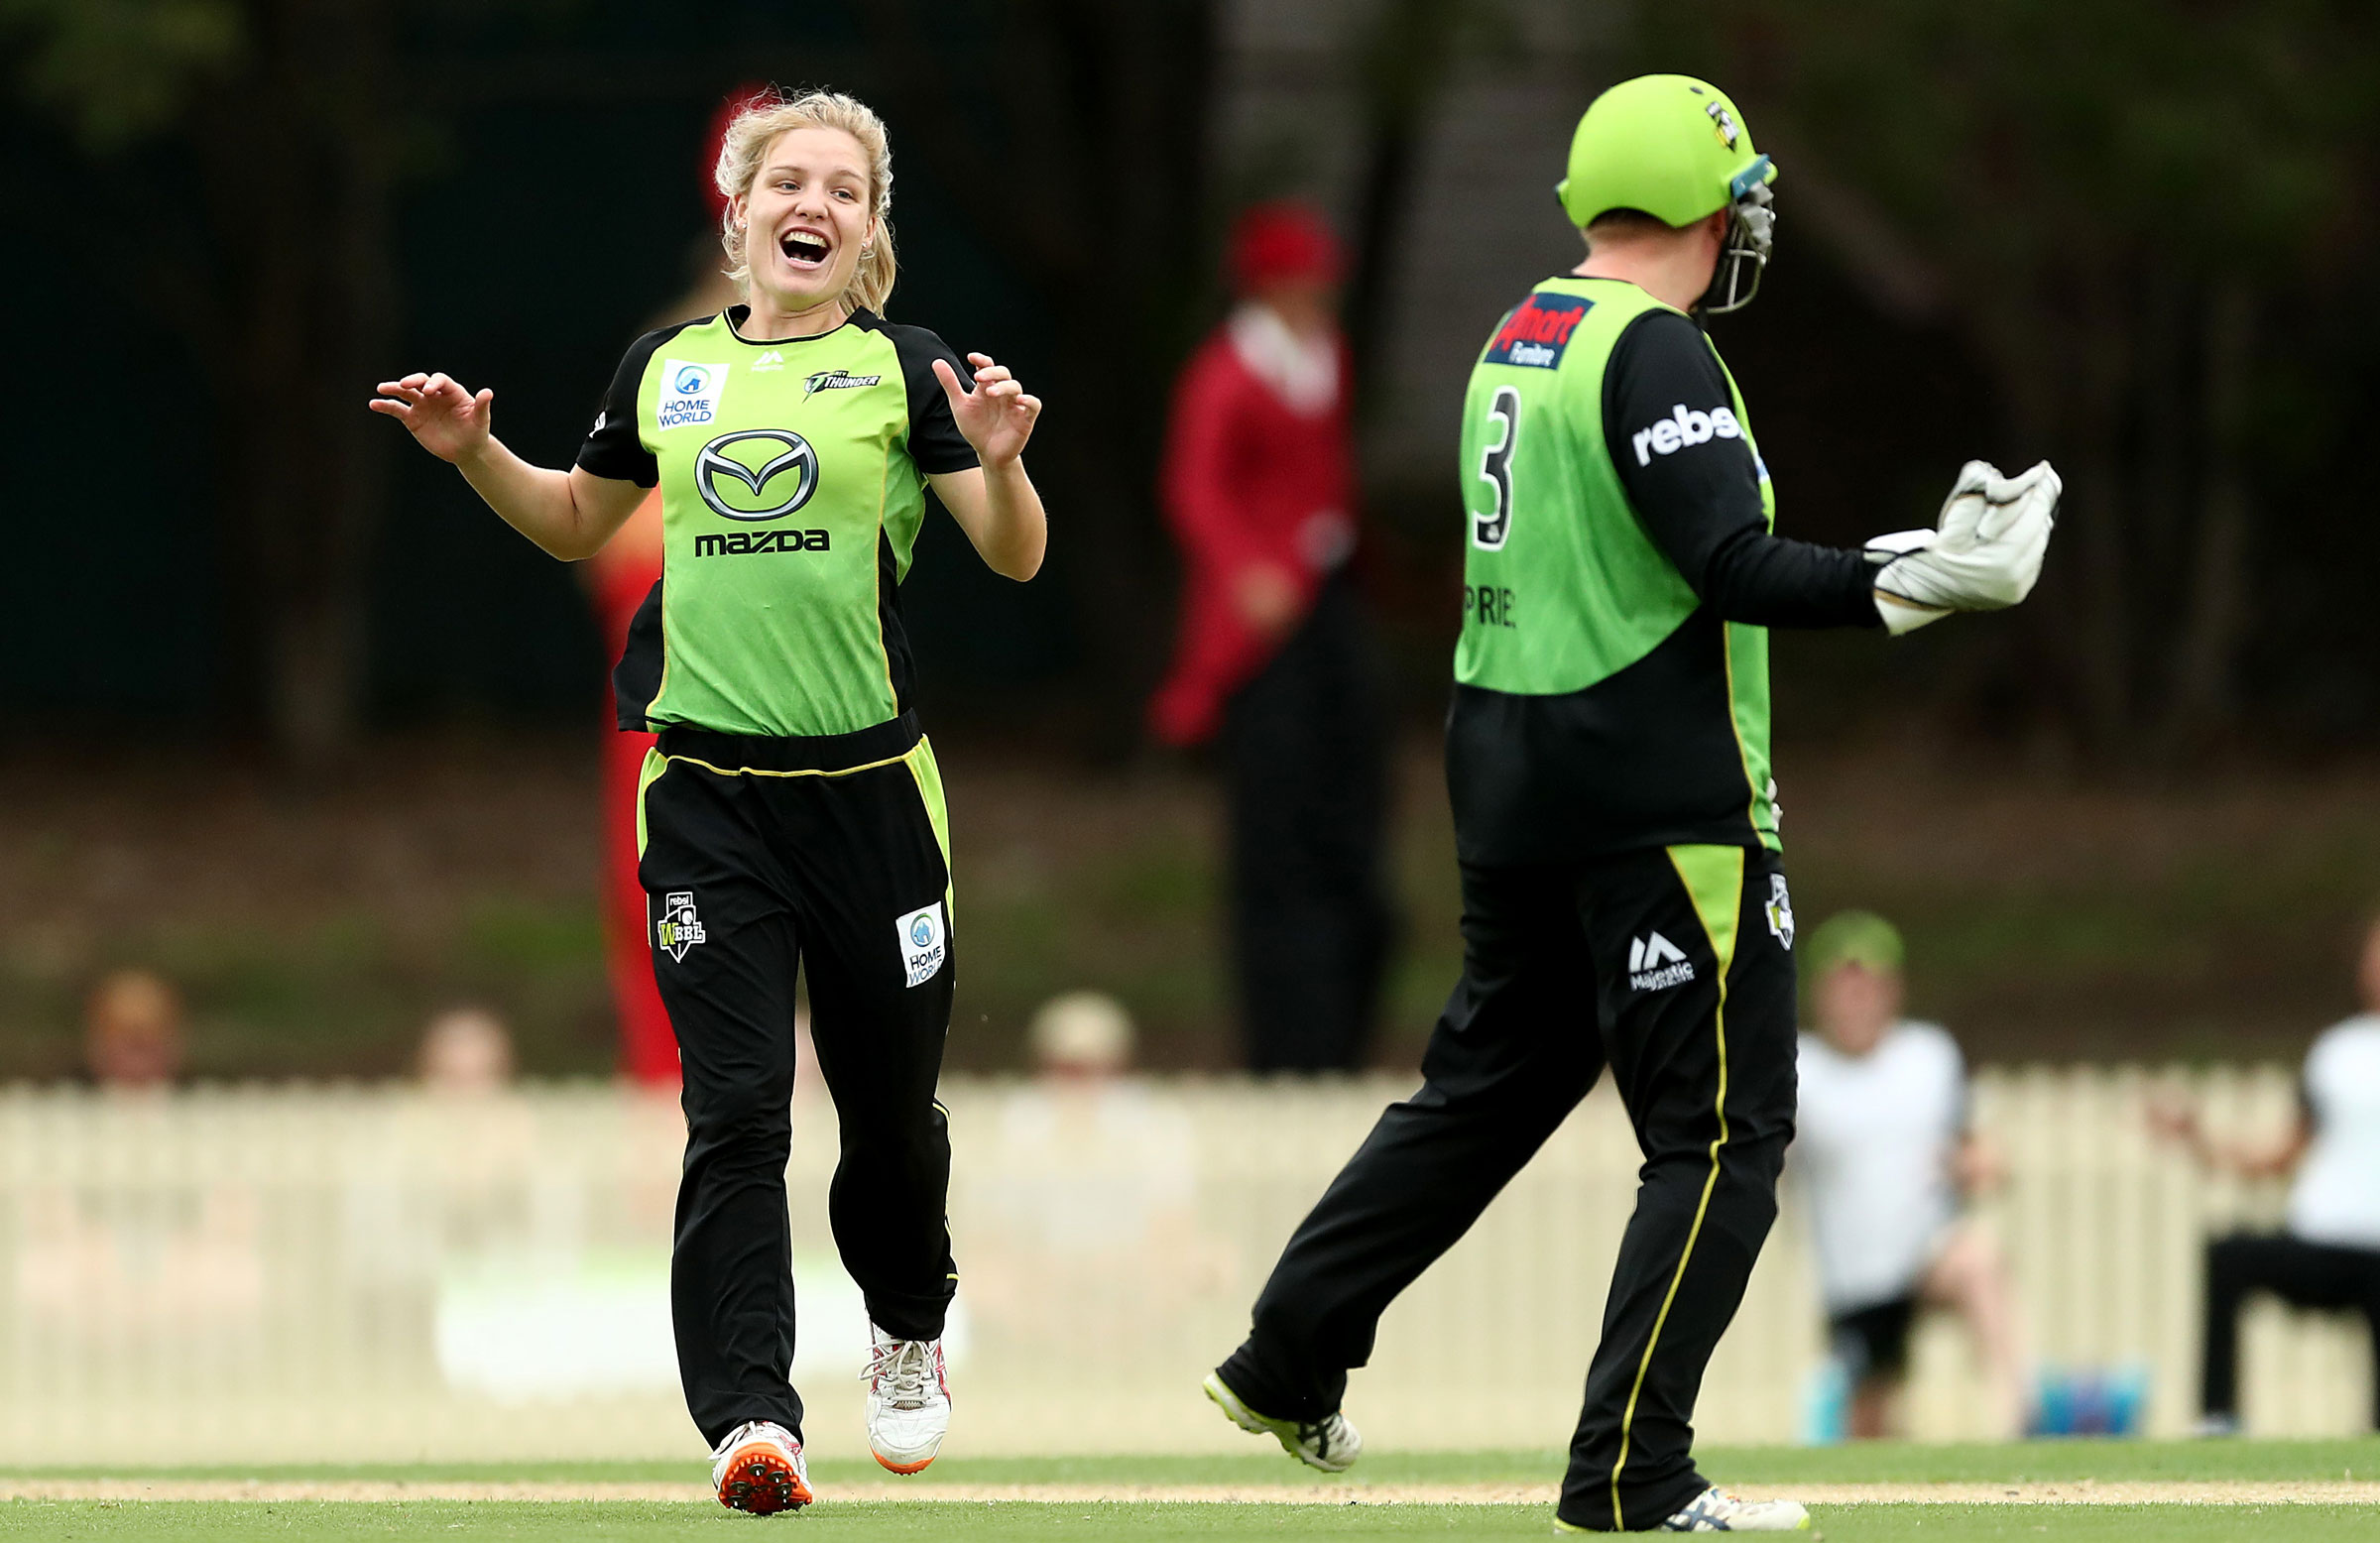 Nicola Carey has moved to Tasmania // Getty